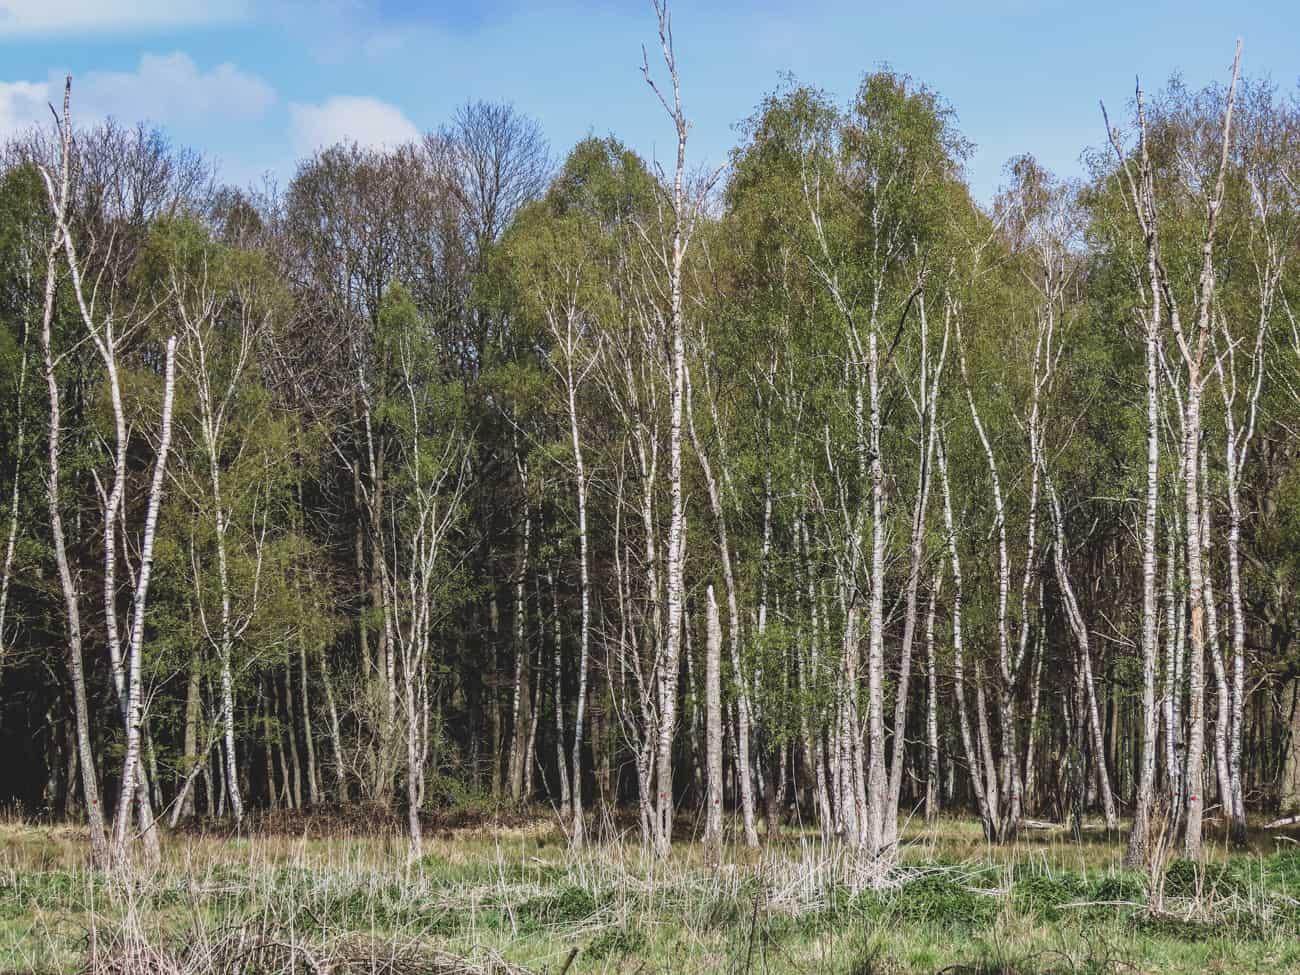 rambouillet-espace-rambouillet-spectacle-rapaces-cerfs-16